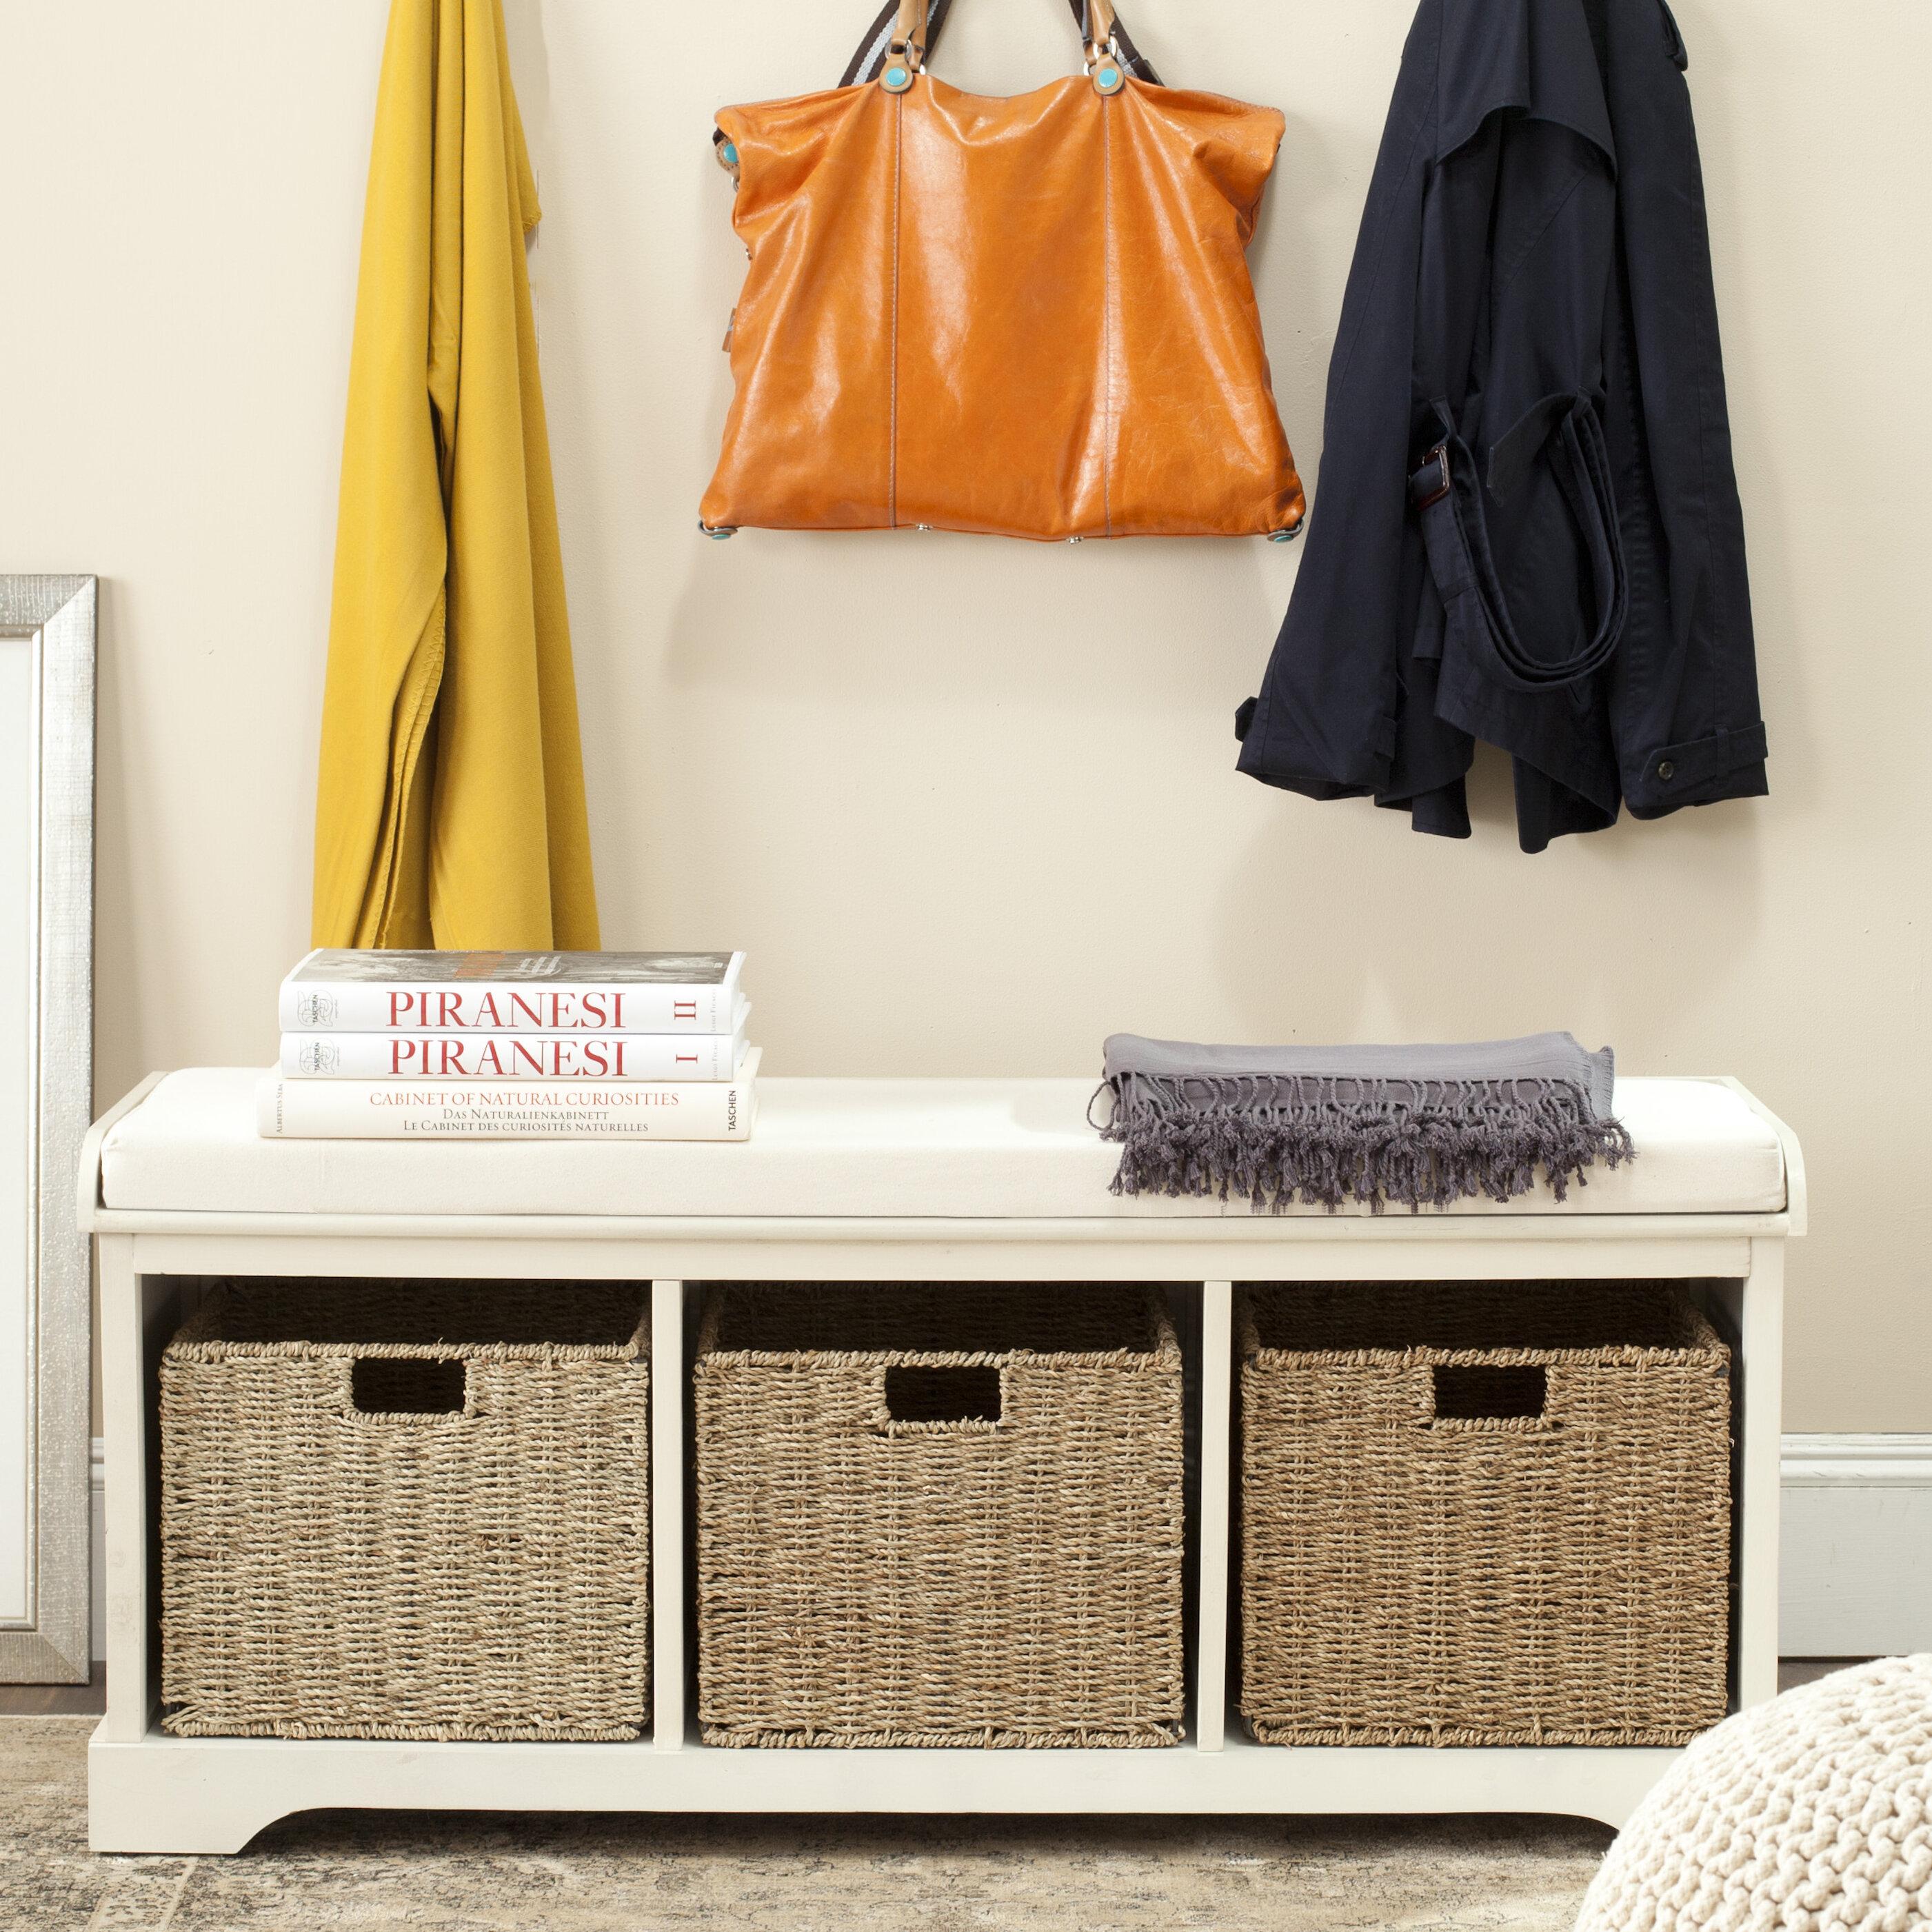 Santa Cruz Upholstered Cubby Storage Bench Reviews Joss Main